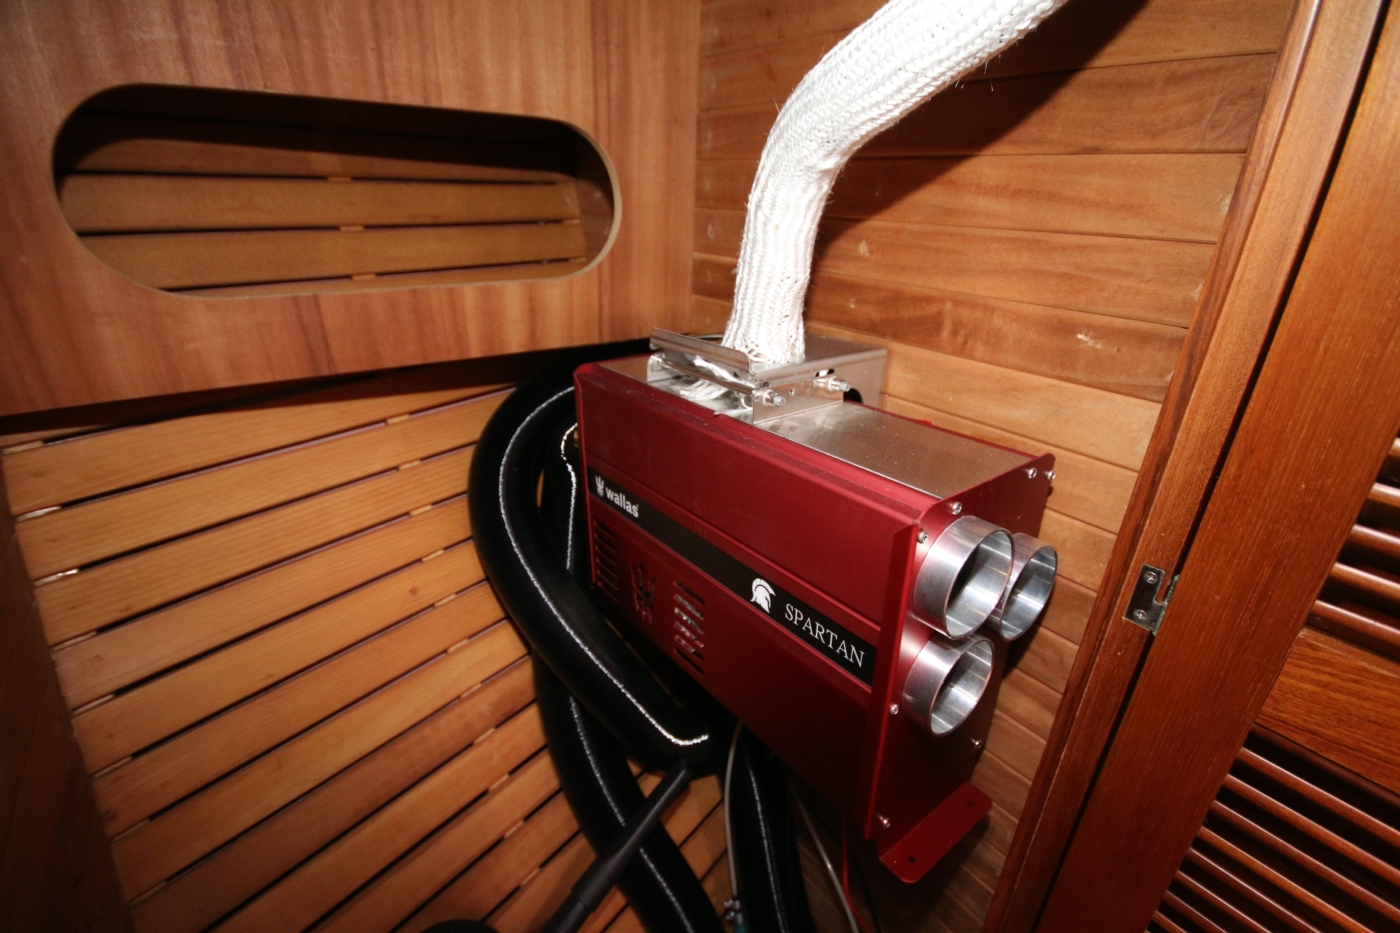 1996 Tanton 45 Offshore, Diesel heater